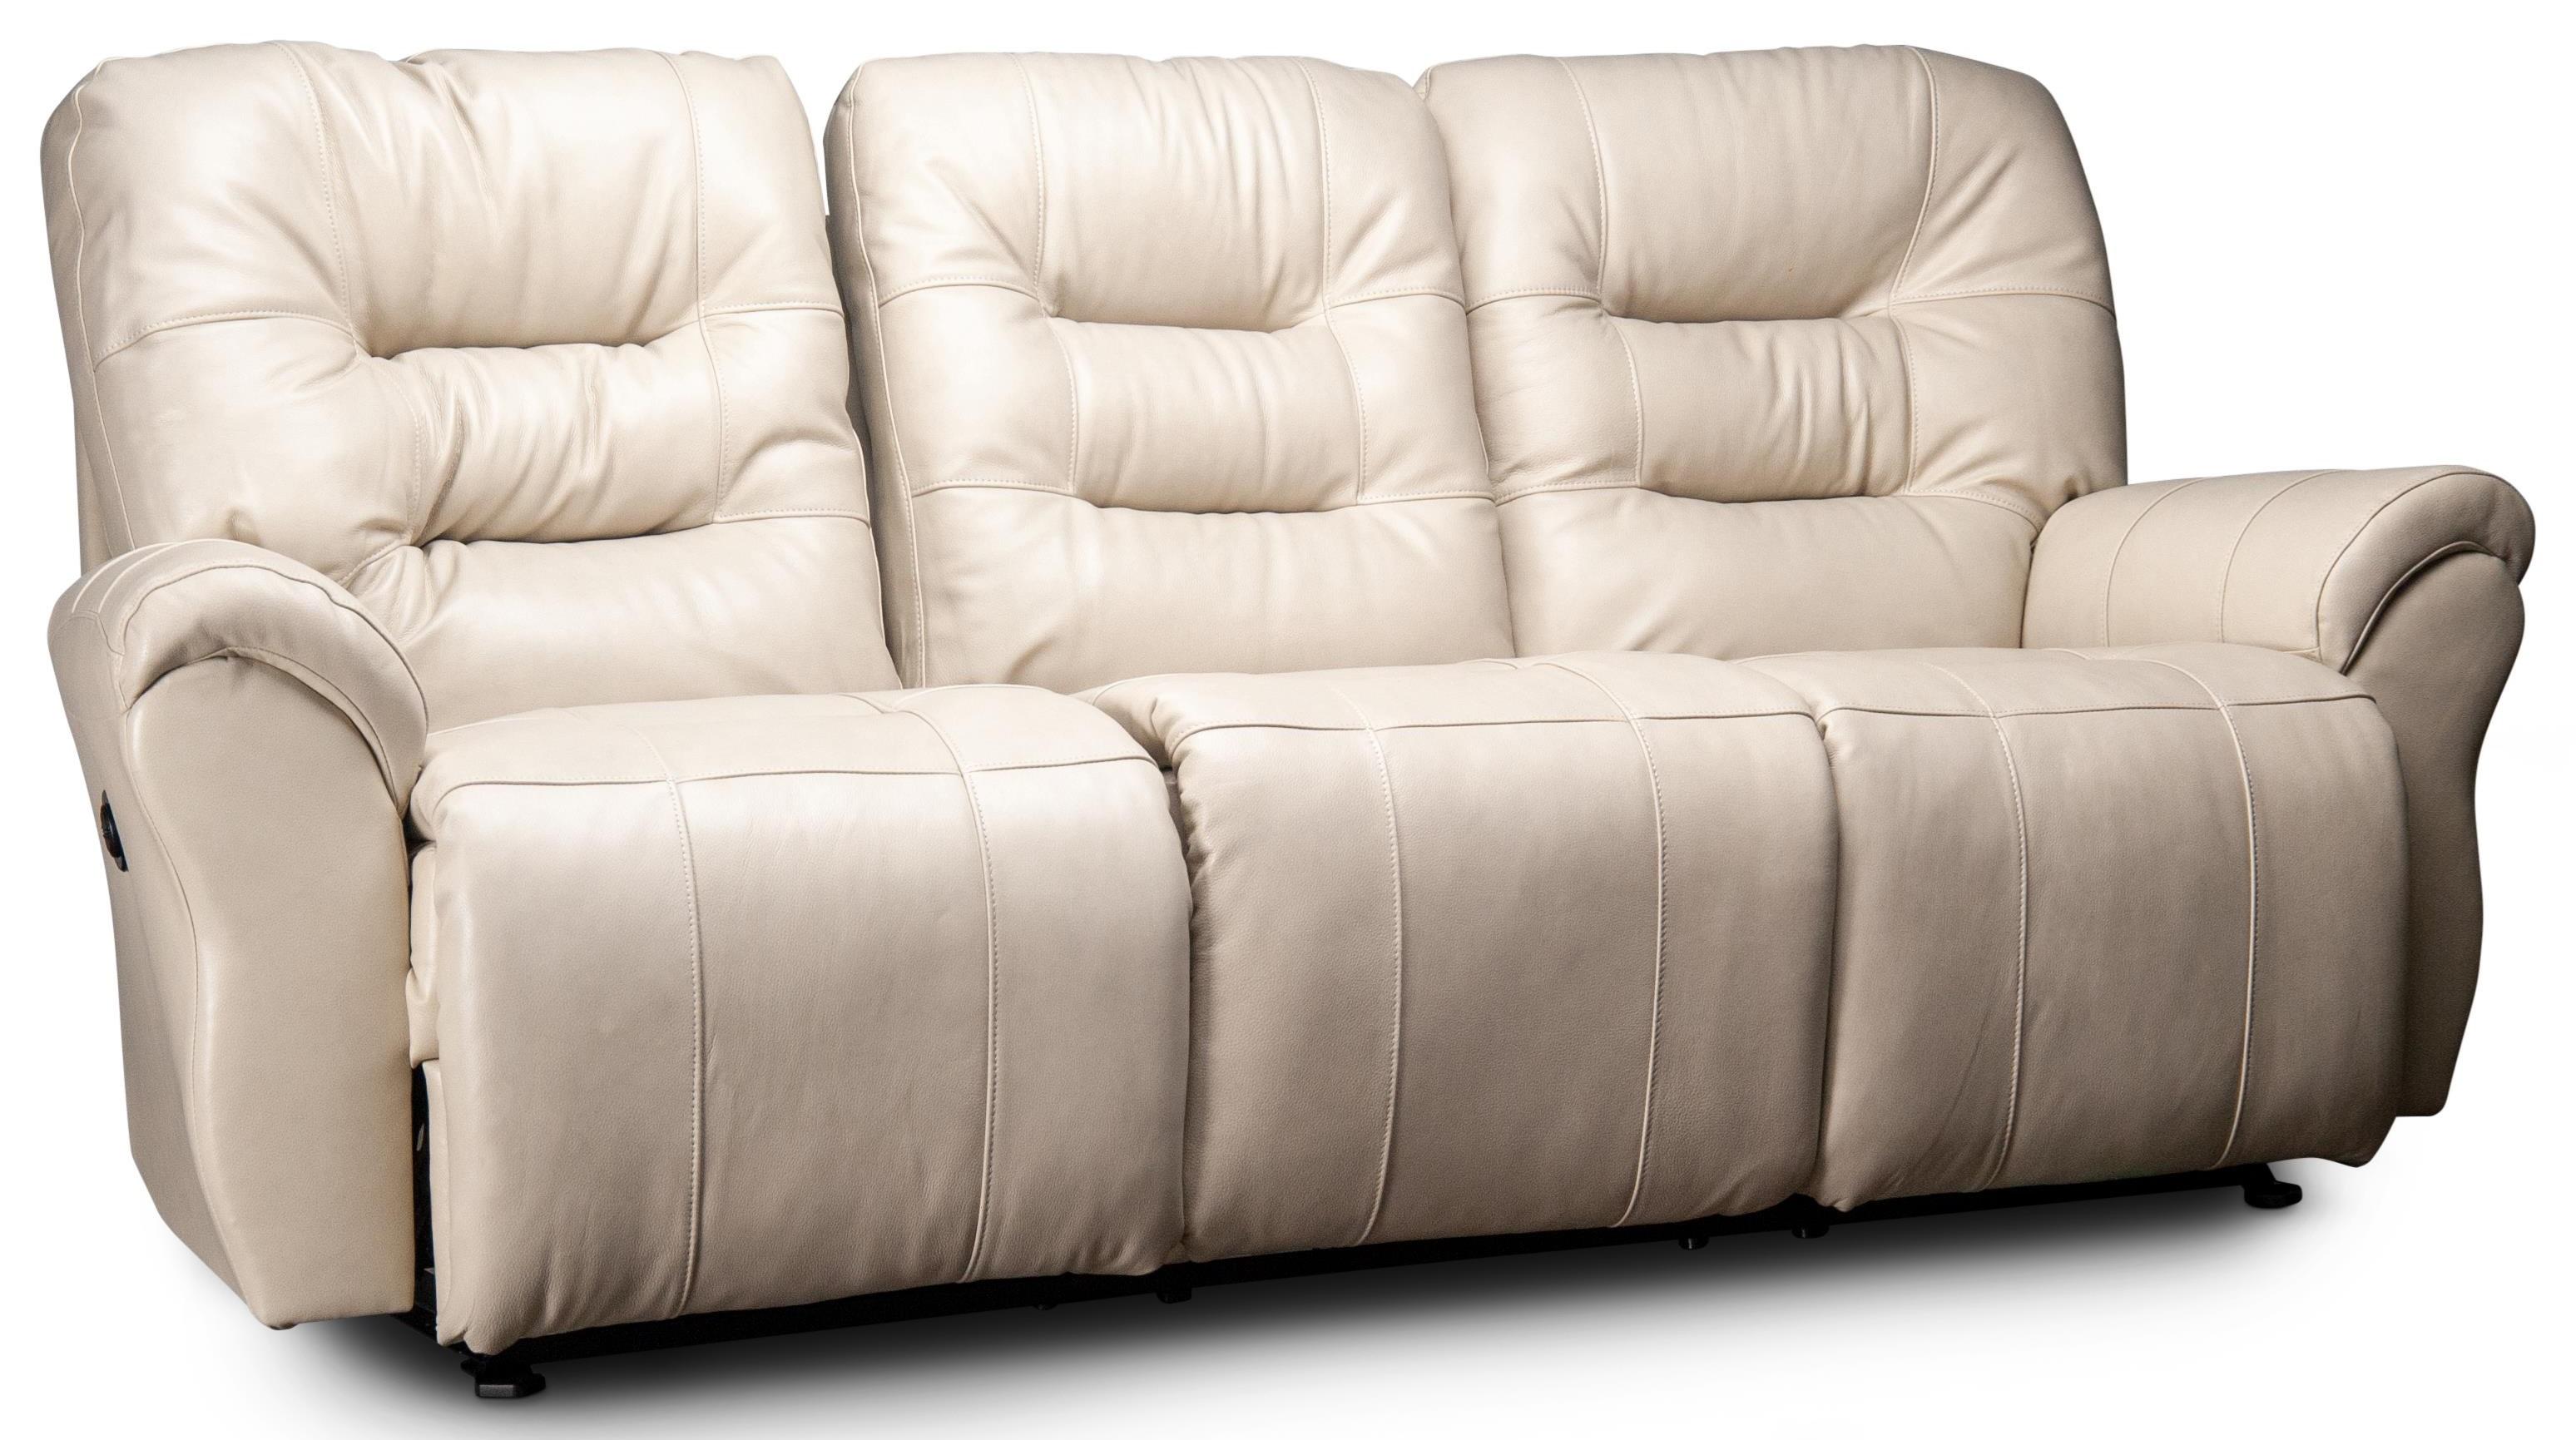 Kadarka Kadarka Leather Match Power Sofa by Best Home Furnishings at Morris Home